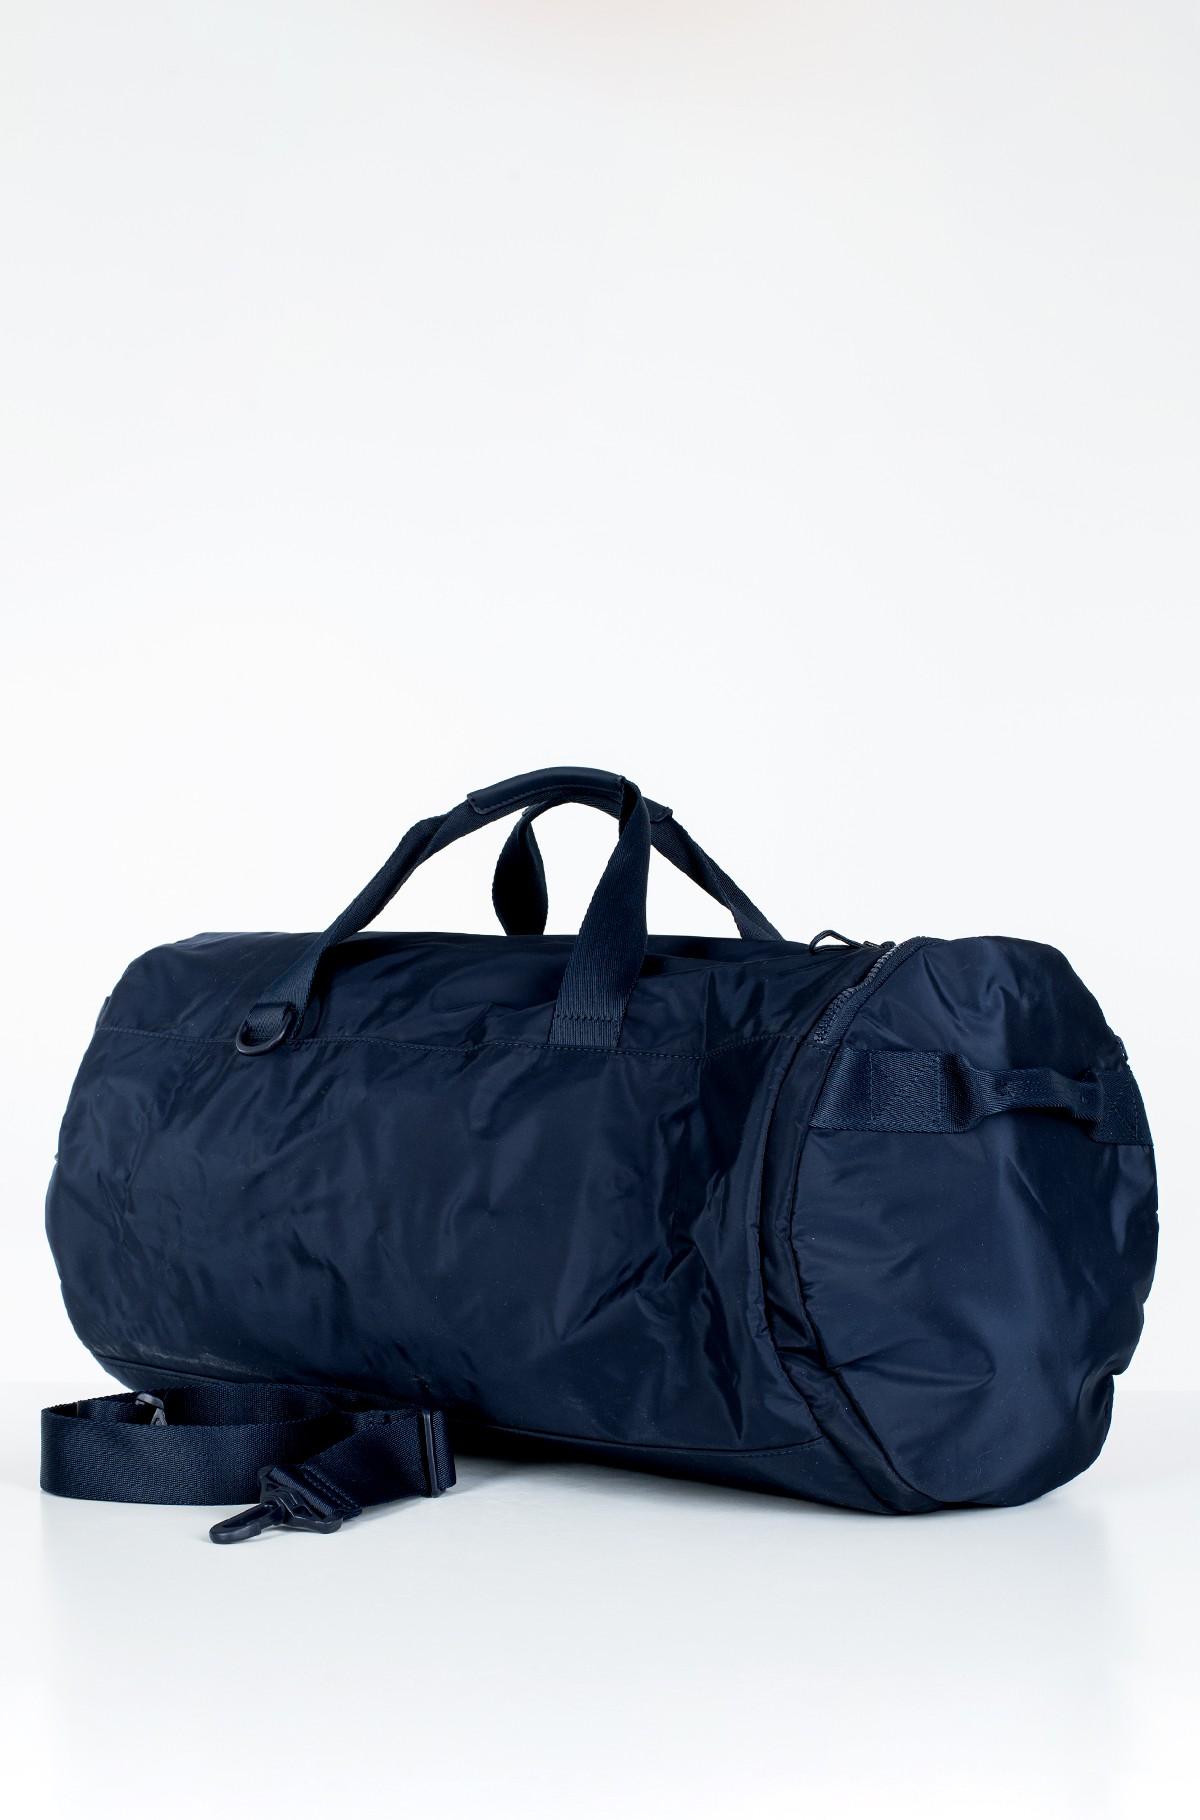 Kelioninis krepšys  TOMMY CONVERTIBLE DUFFLE-full-2